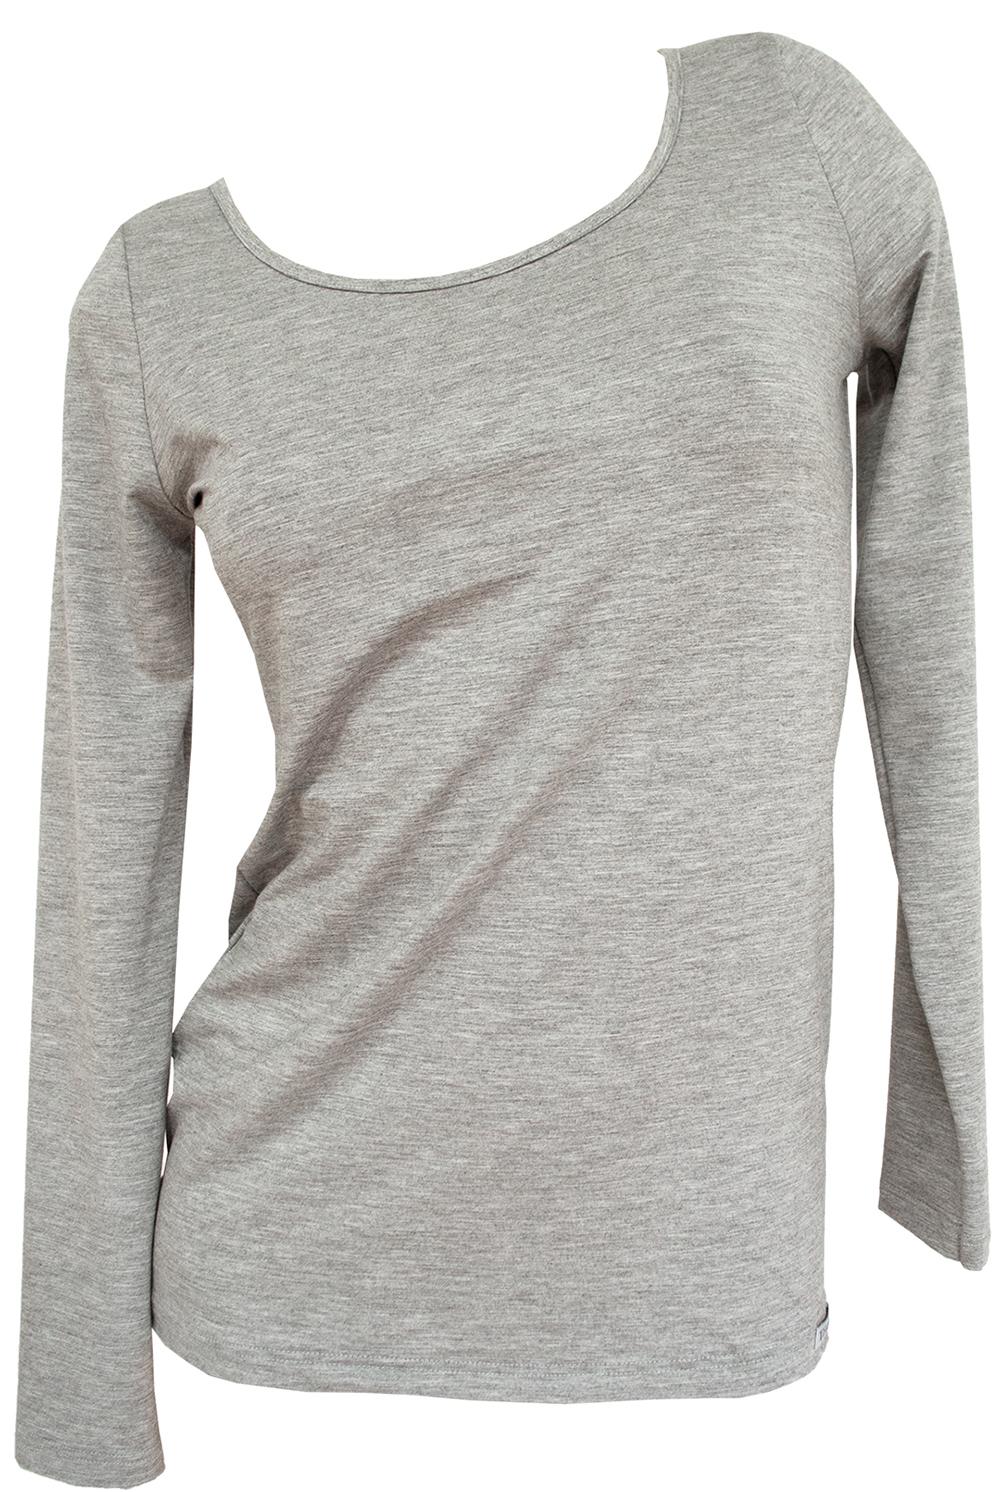 114cc19805584c Damen Langarmshirts & Longshirts   THIEME Fashion Shop